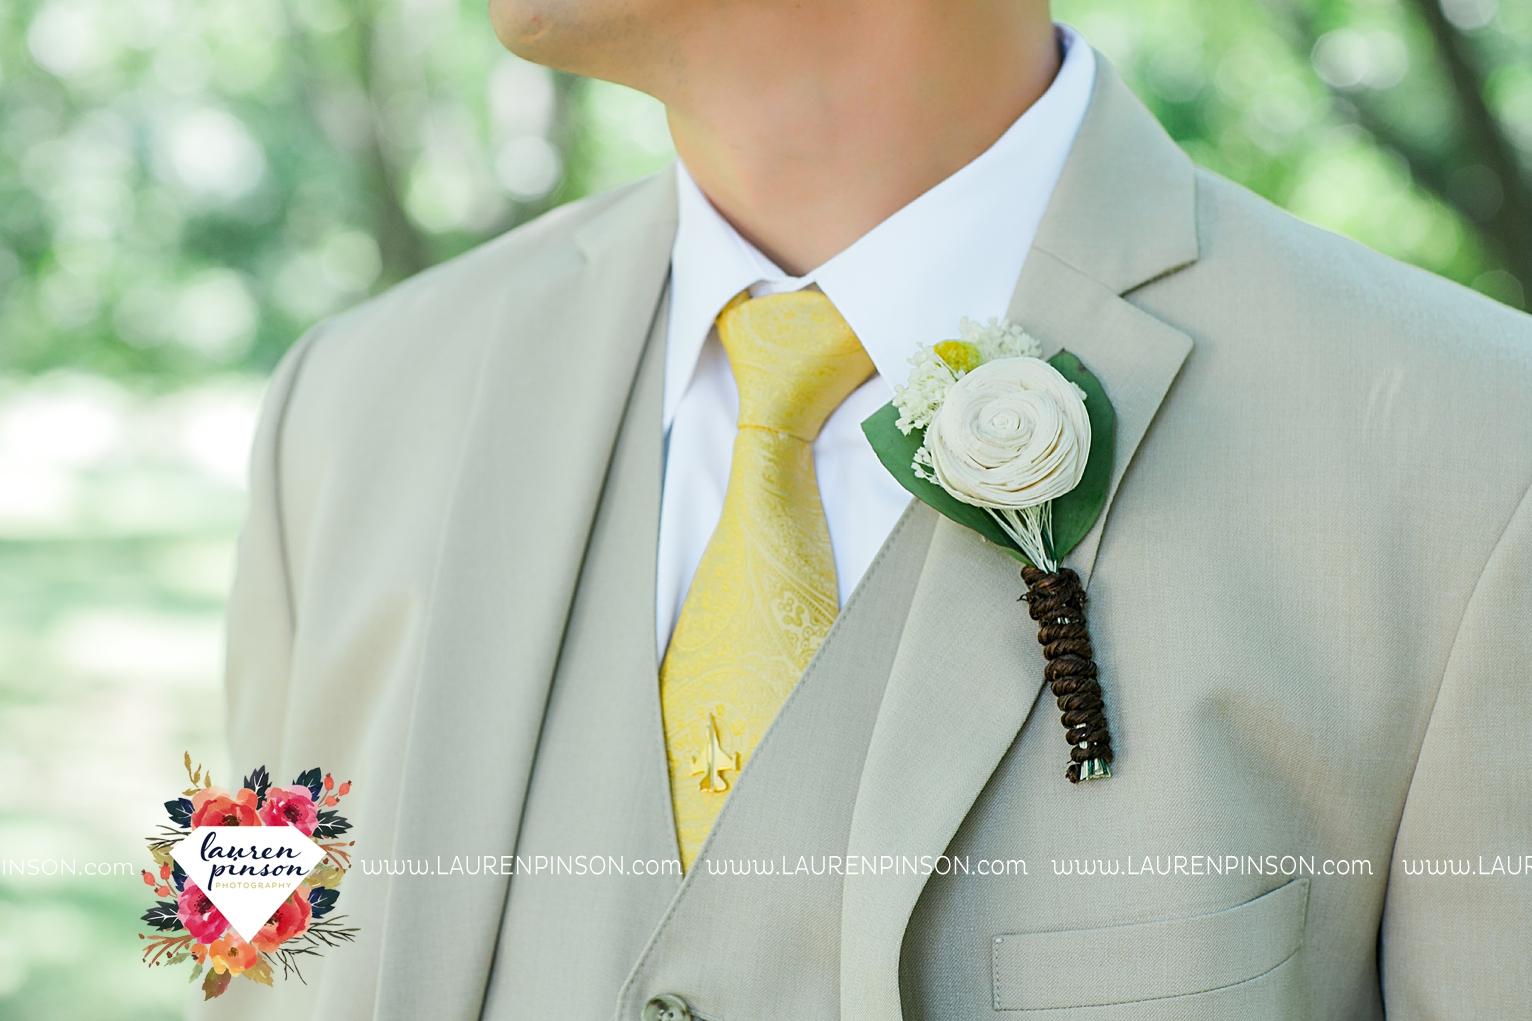 weatherford-texas-hollow-hill-farm-event-wedding-mineral-wells-dfw-wedding-photographer-wichita-falls-photography_3146.jpg